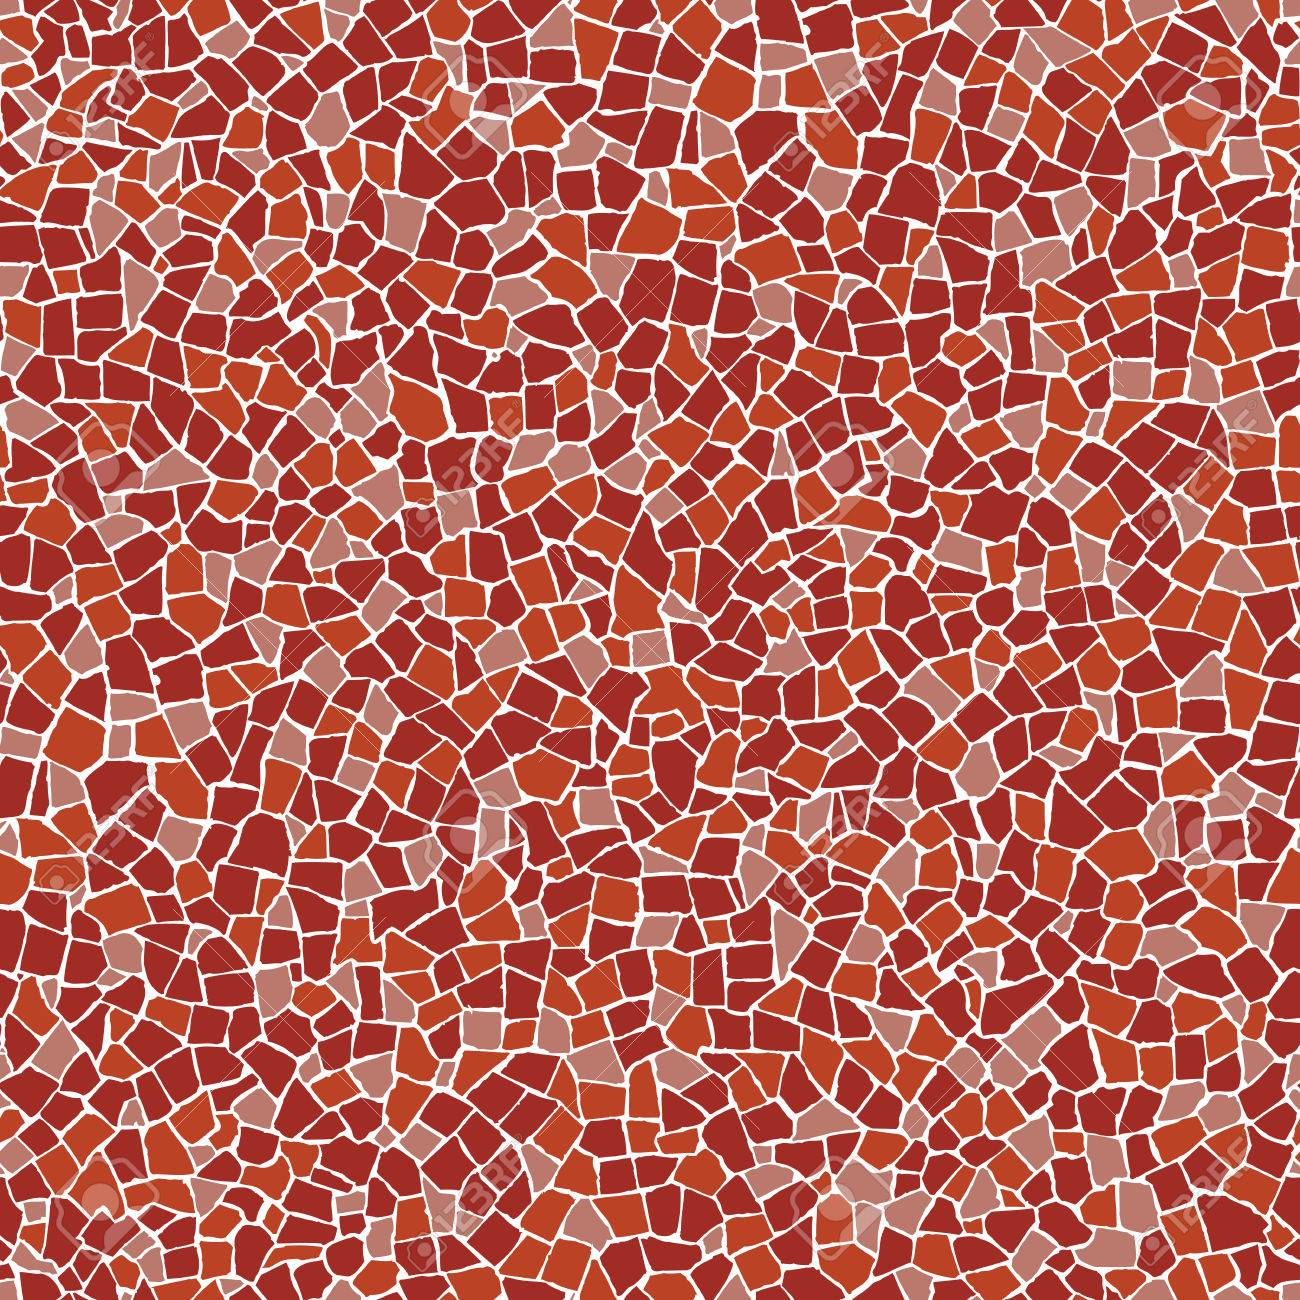 Trencadis red broken tiles (trencadis) seamless pattern royalty-fri clipart